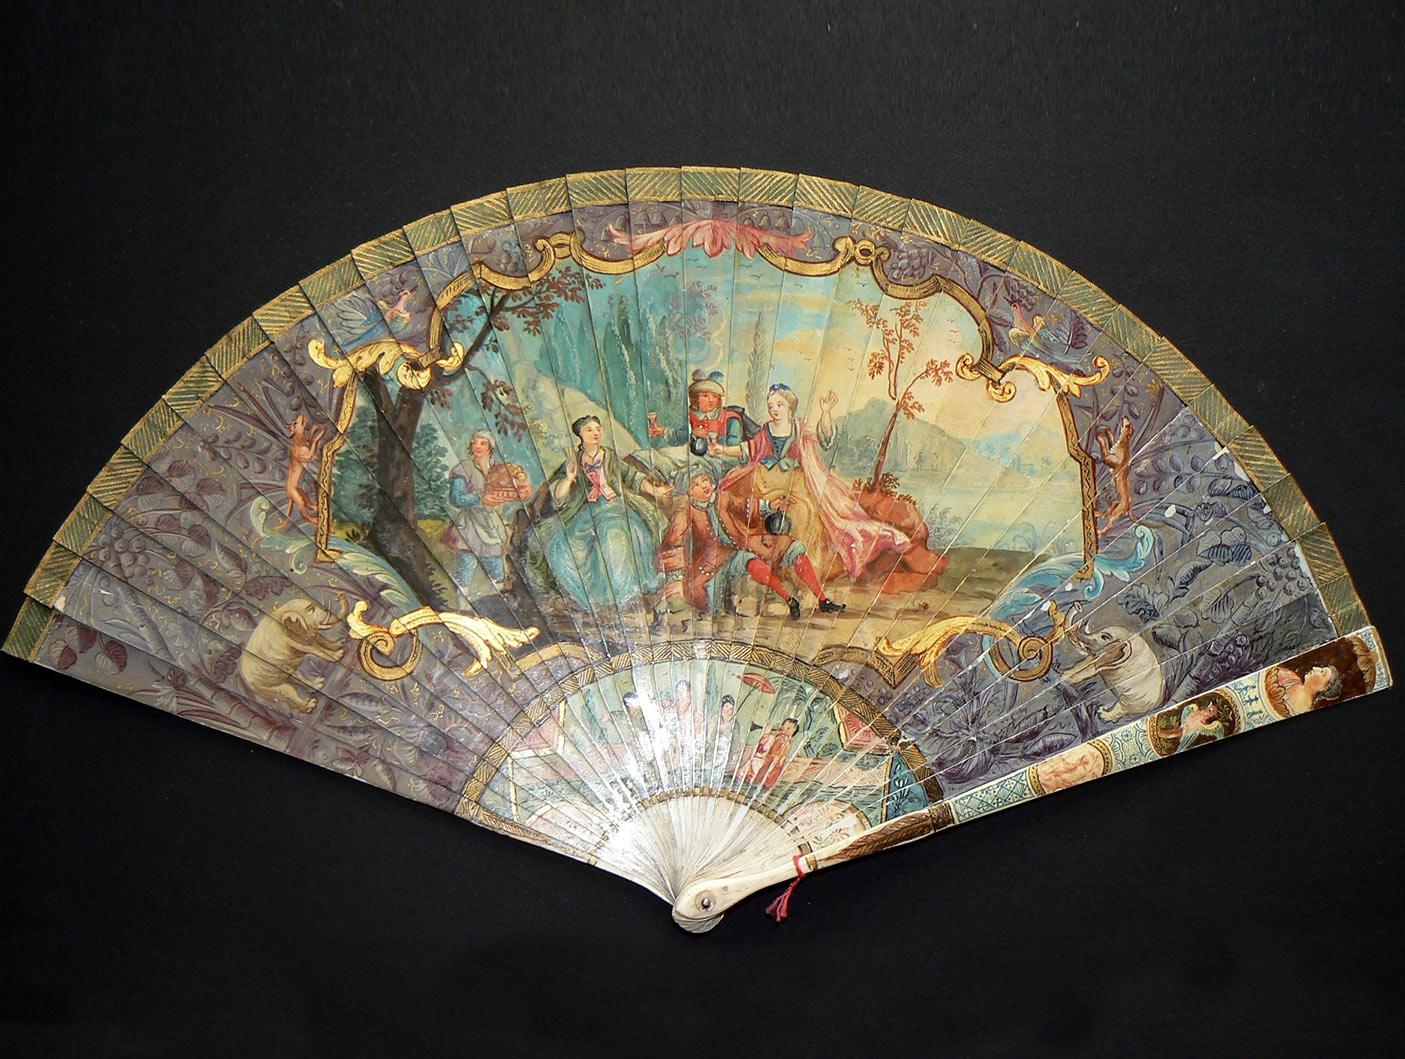 Brisé Fan before restoration